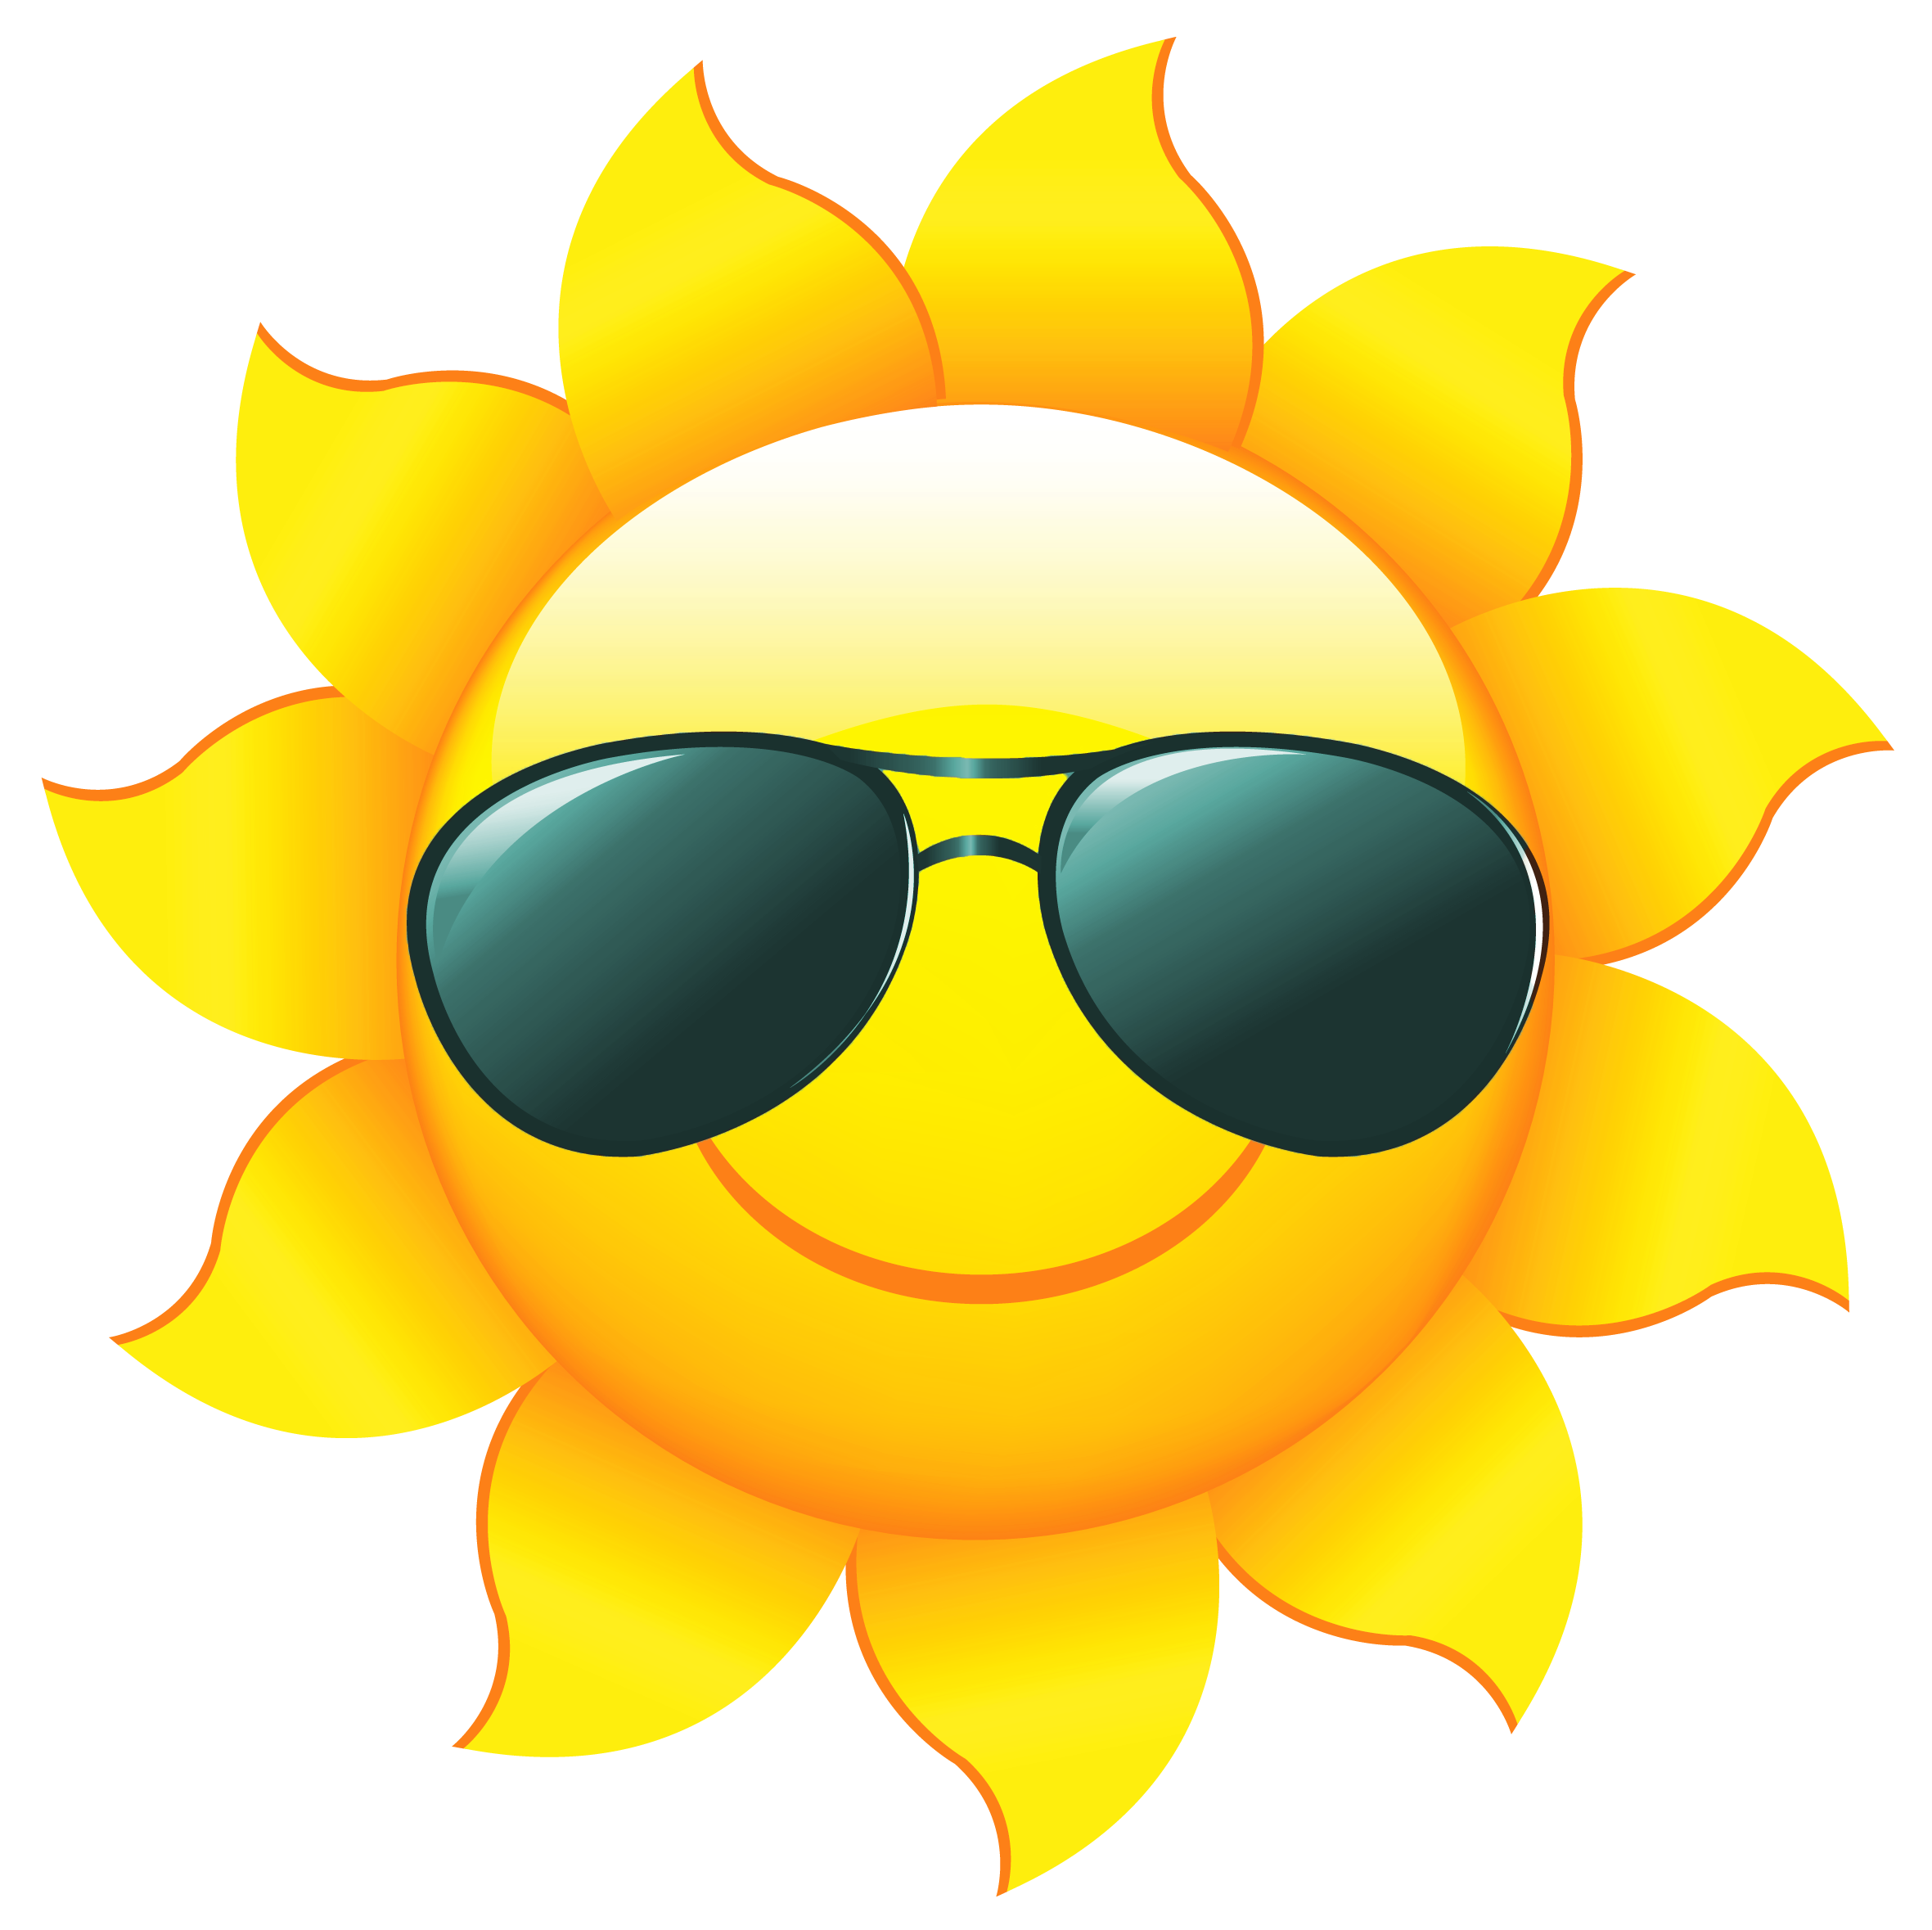 2361x2358 Vibrant Creative Sun Clipart Sunshine Clip Art Free Images 6